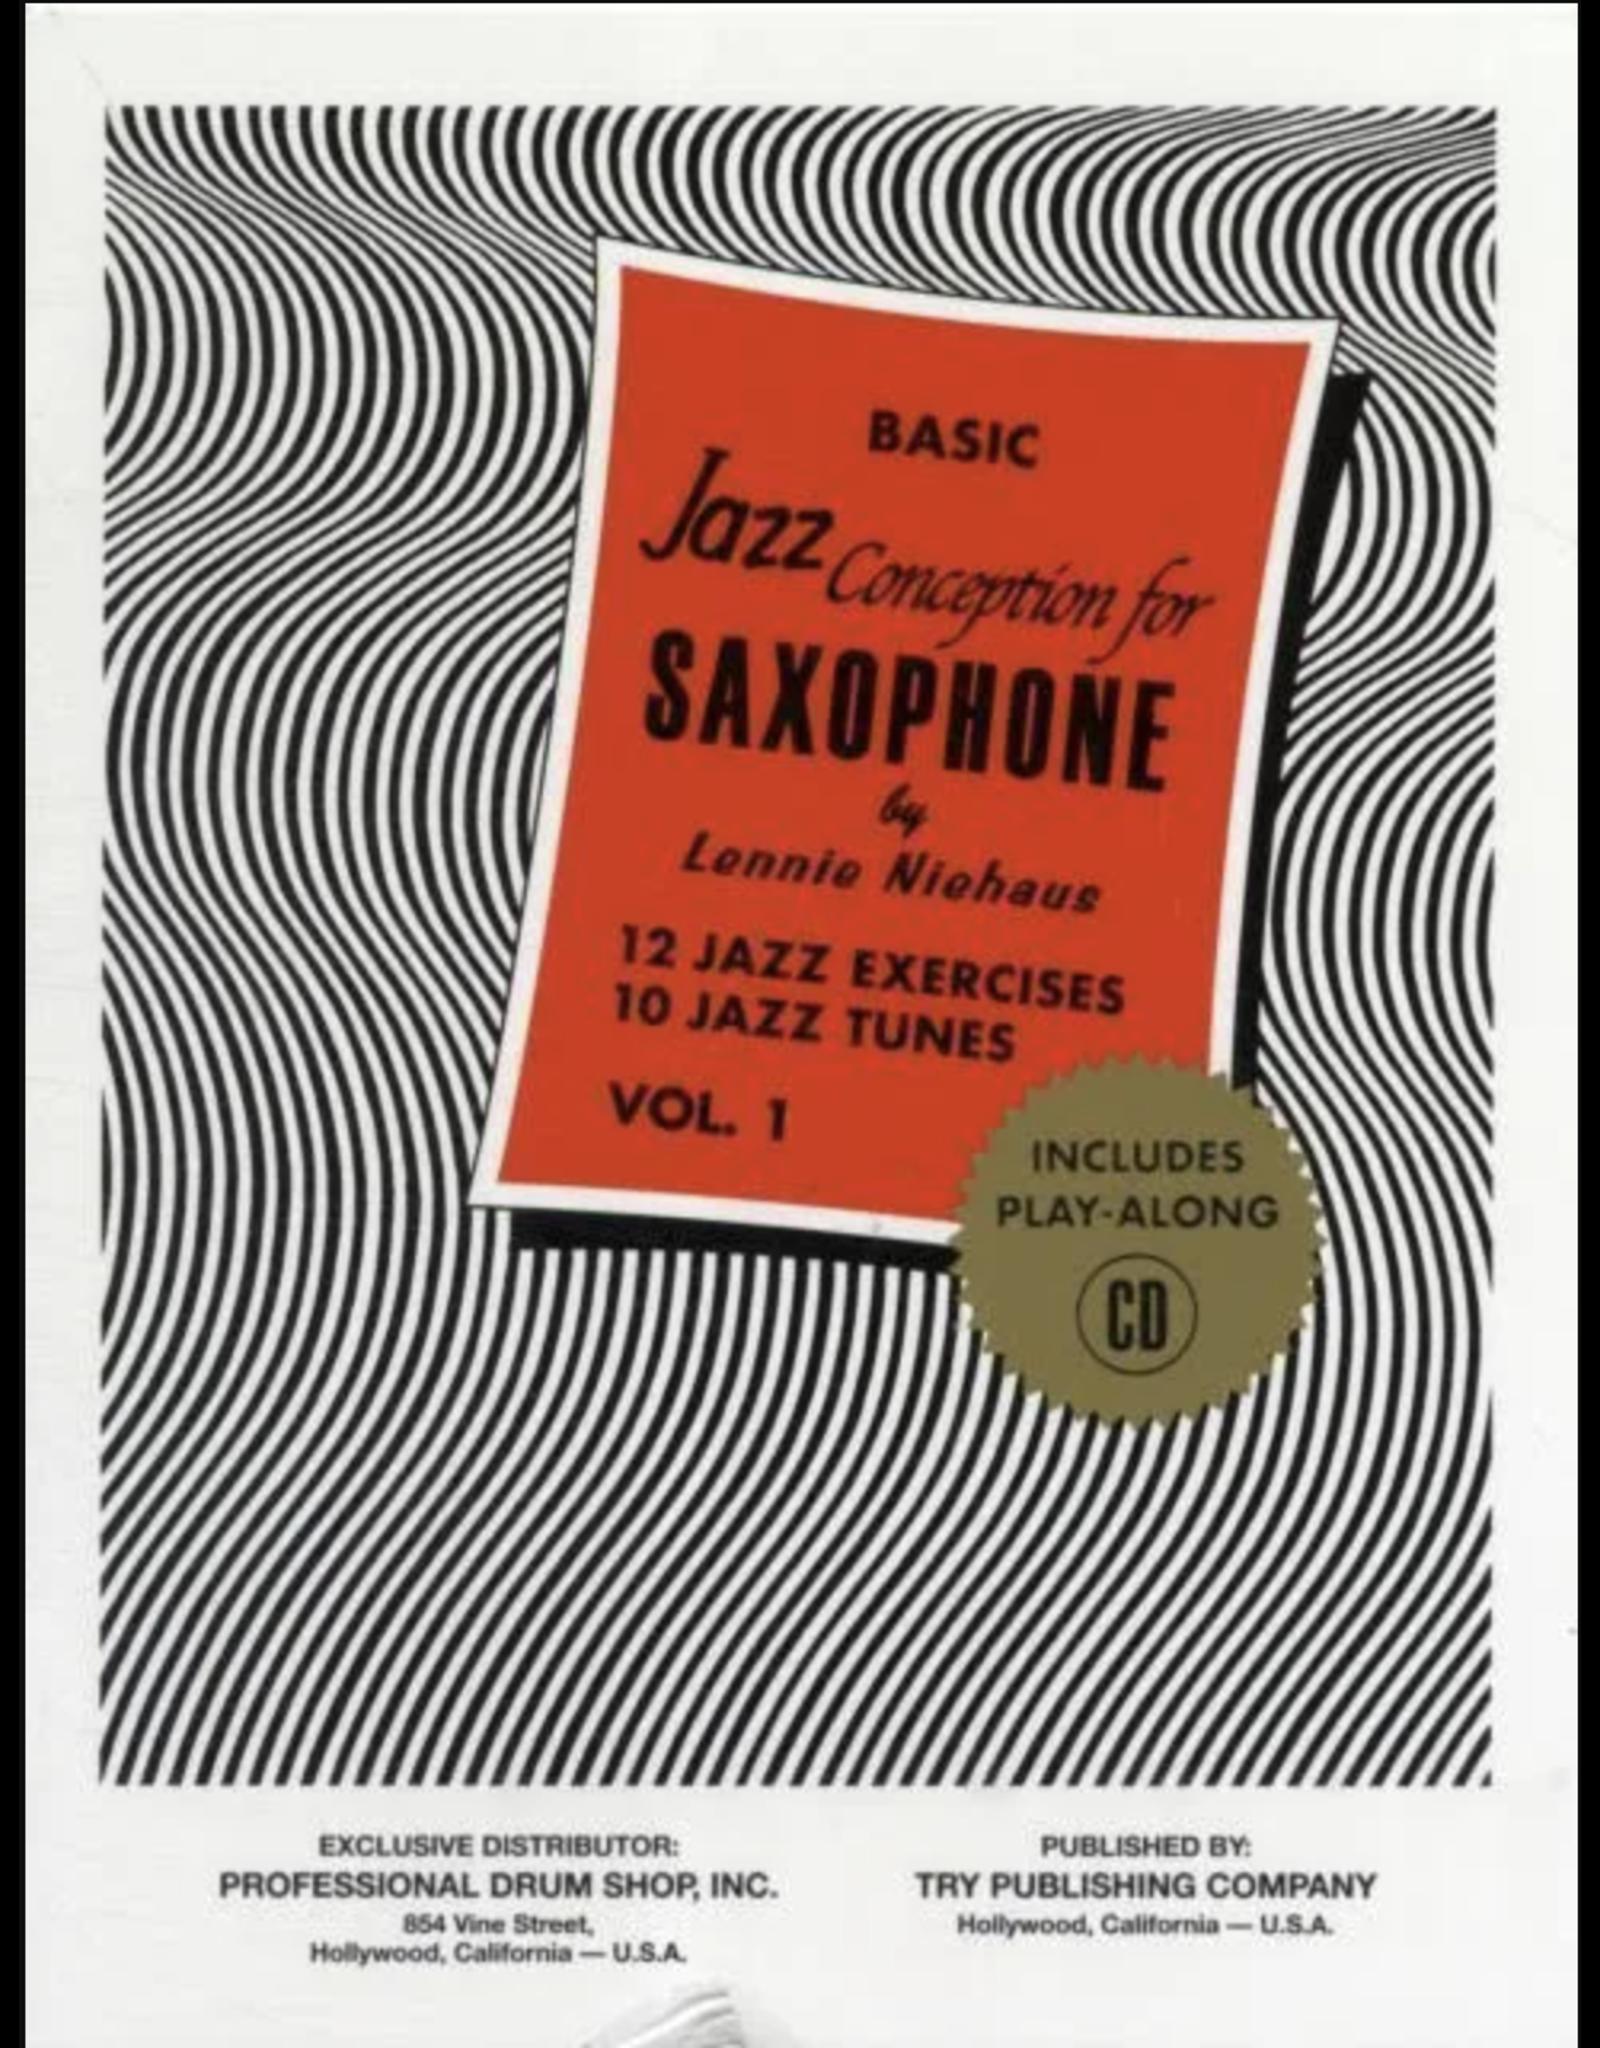 Generic Niehaus Basic Jazz Conception for Saxophone Vol. 1